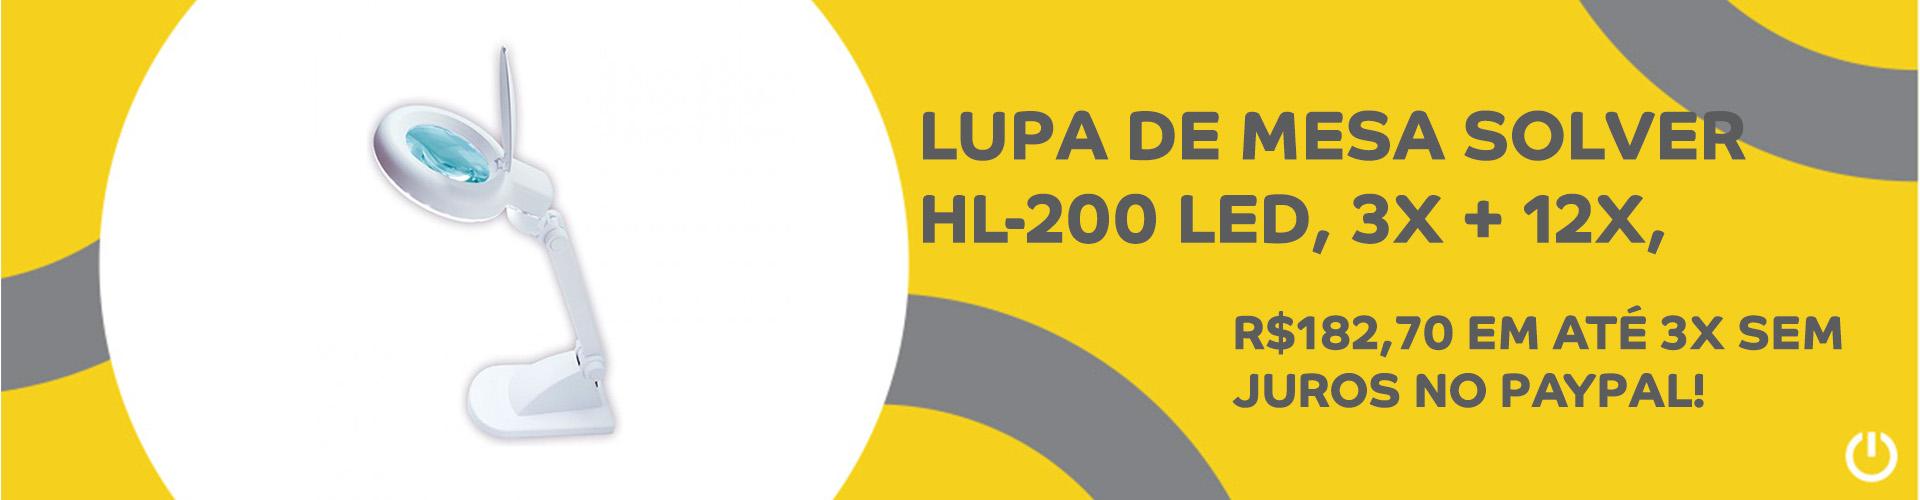 banner lupa hl200